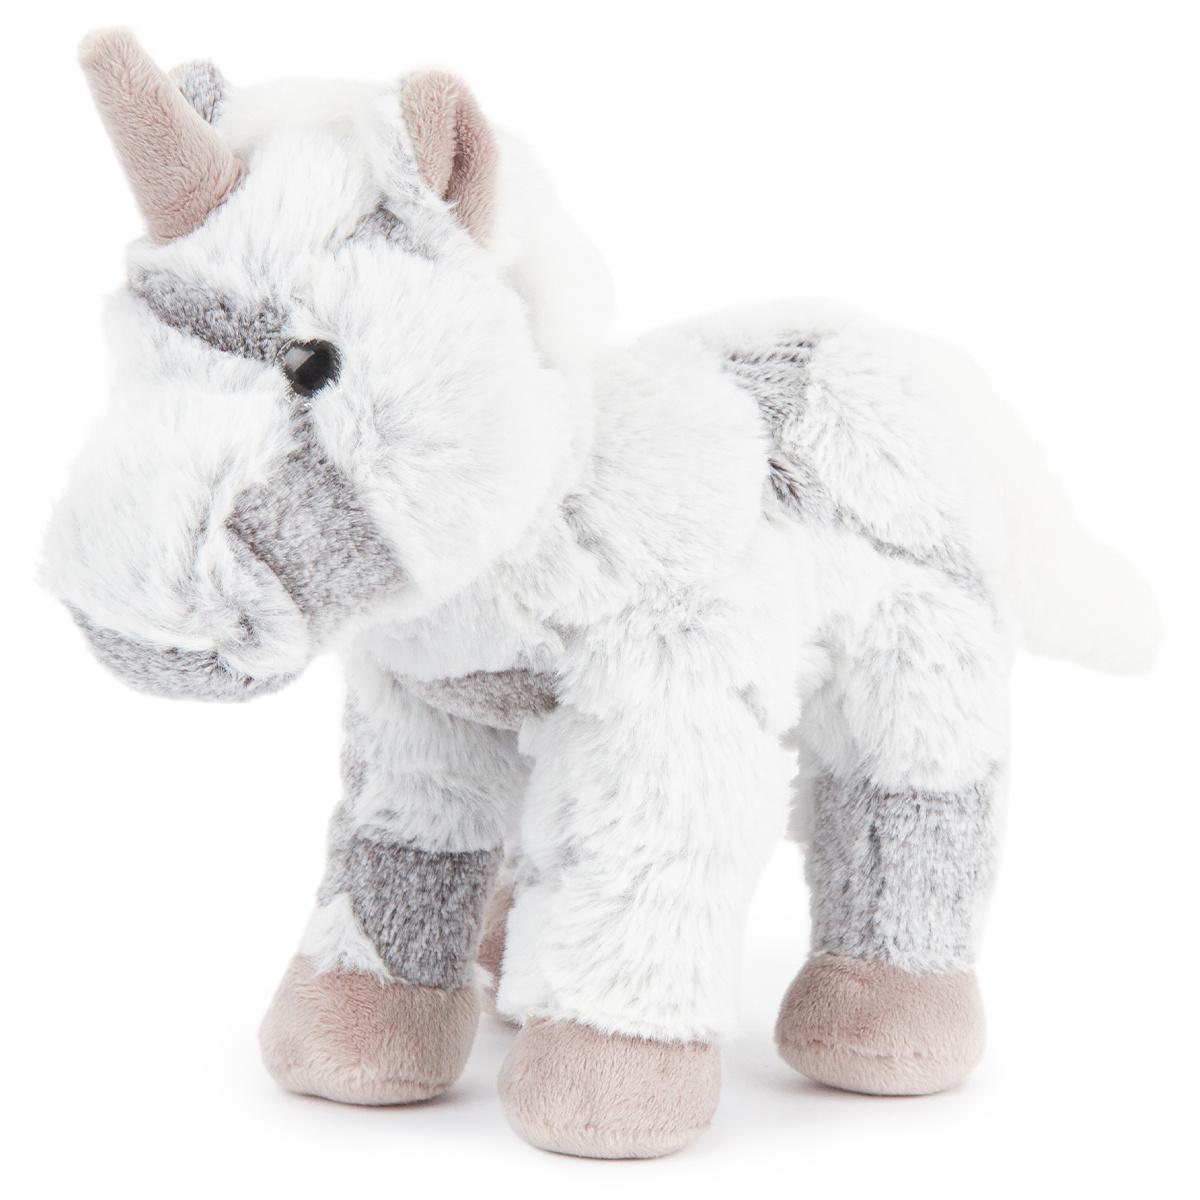 Unicorn din pluș, gri, 23 cm imagine 2021 e4home.ro